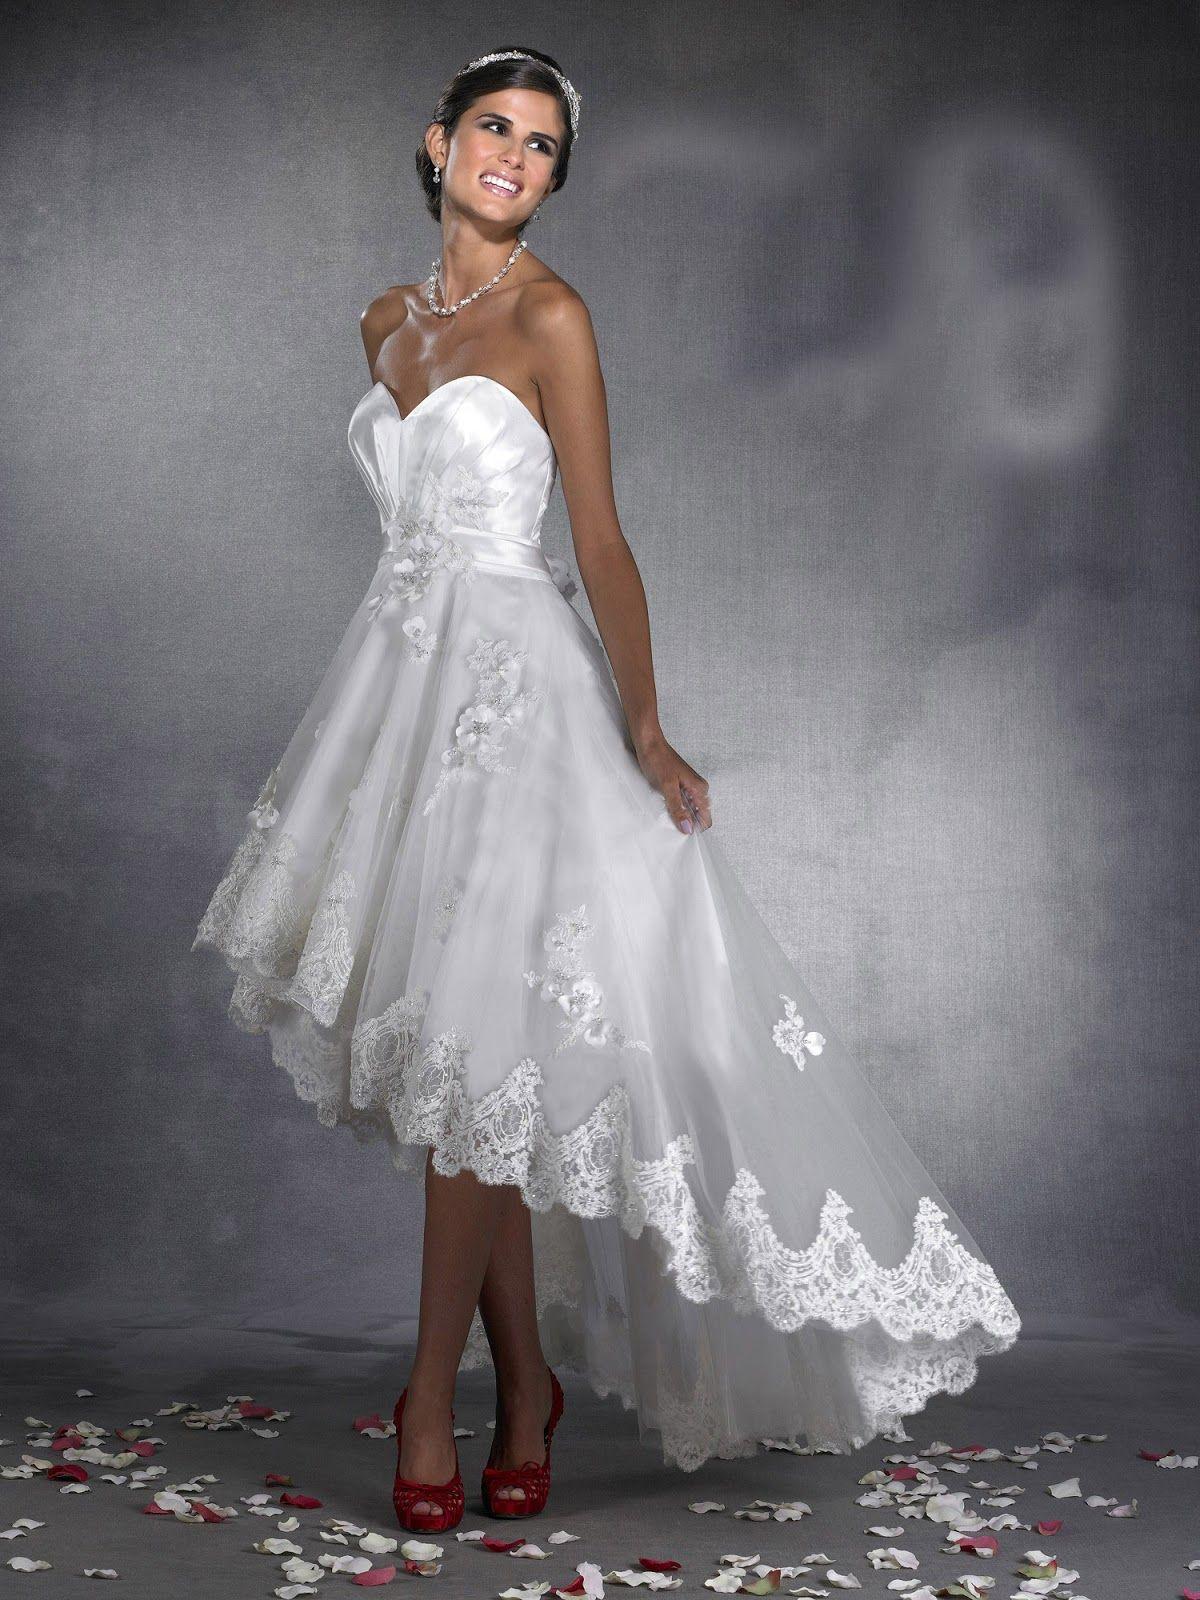 White High Low Dress Beautiful Wedding Dresses 2012 This Is: White High Low Wedding Dress At Reisefeber.org